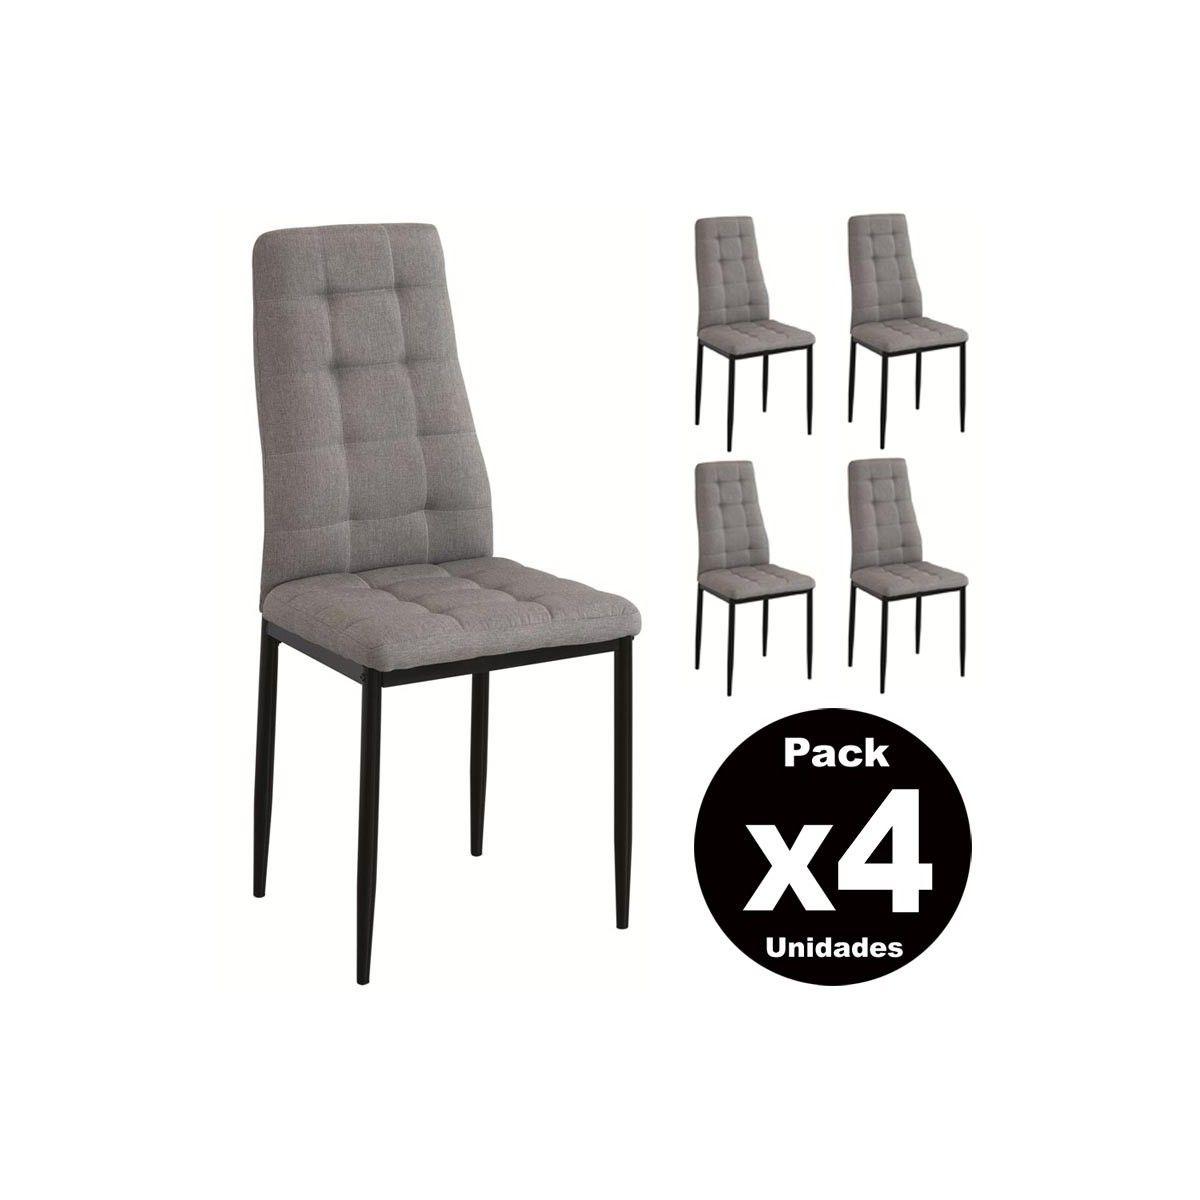 Pack 4 sillas salón comedor SONIA | Sillas tapizadas baratas